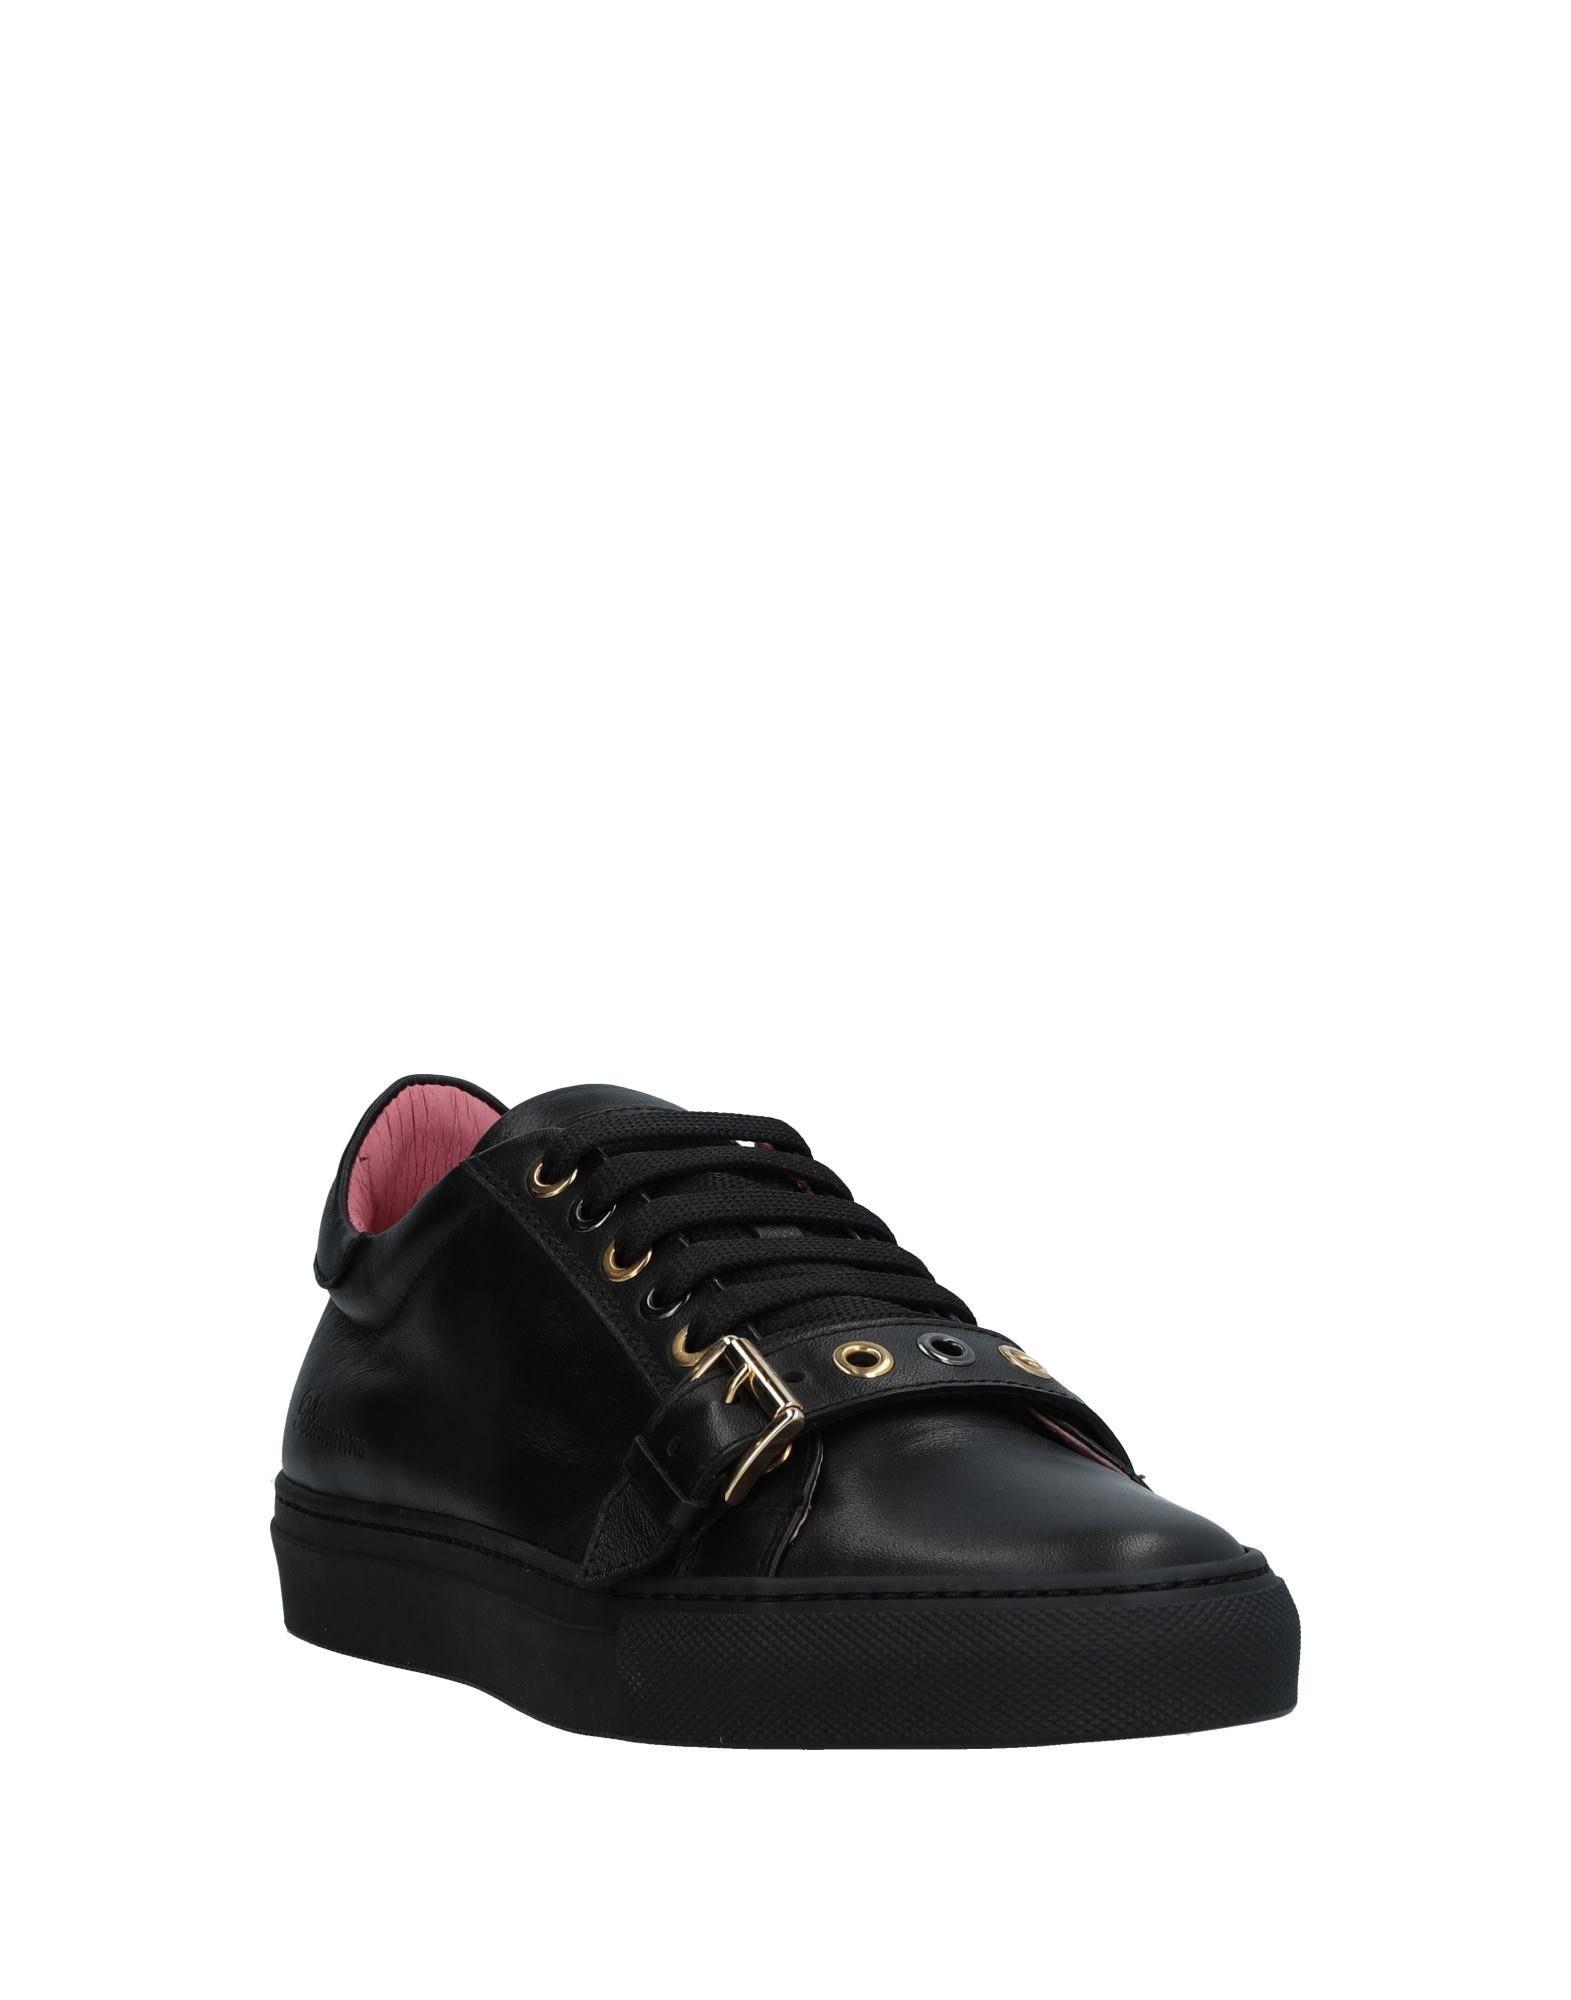 Rabatt Blumarine Schuhe Blumarine Rabatt Sneakers Damen  11527317AI db508d